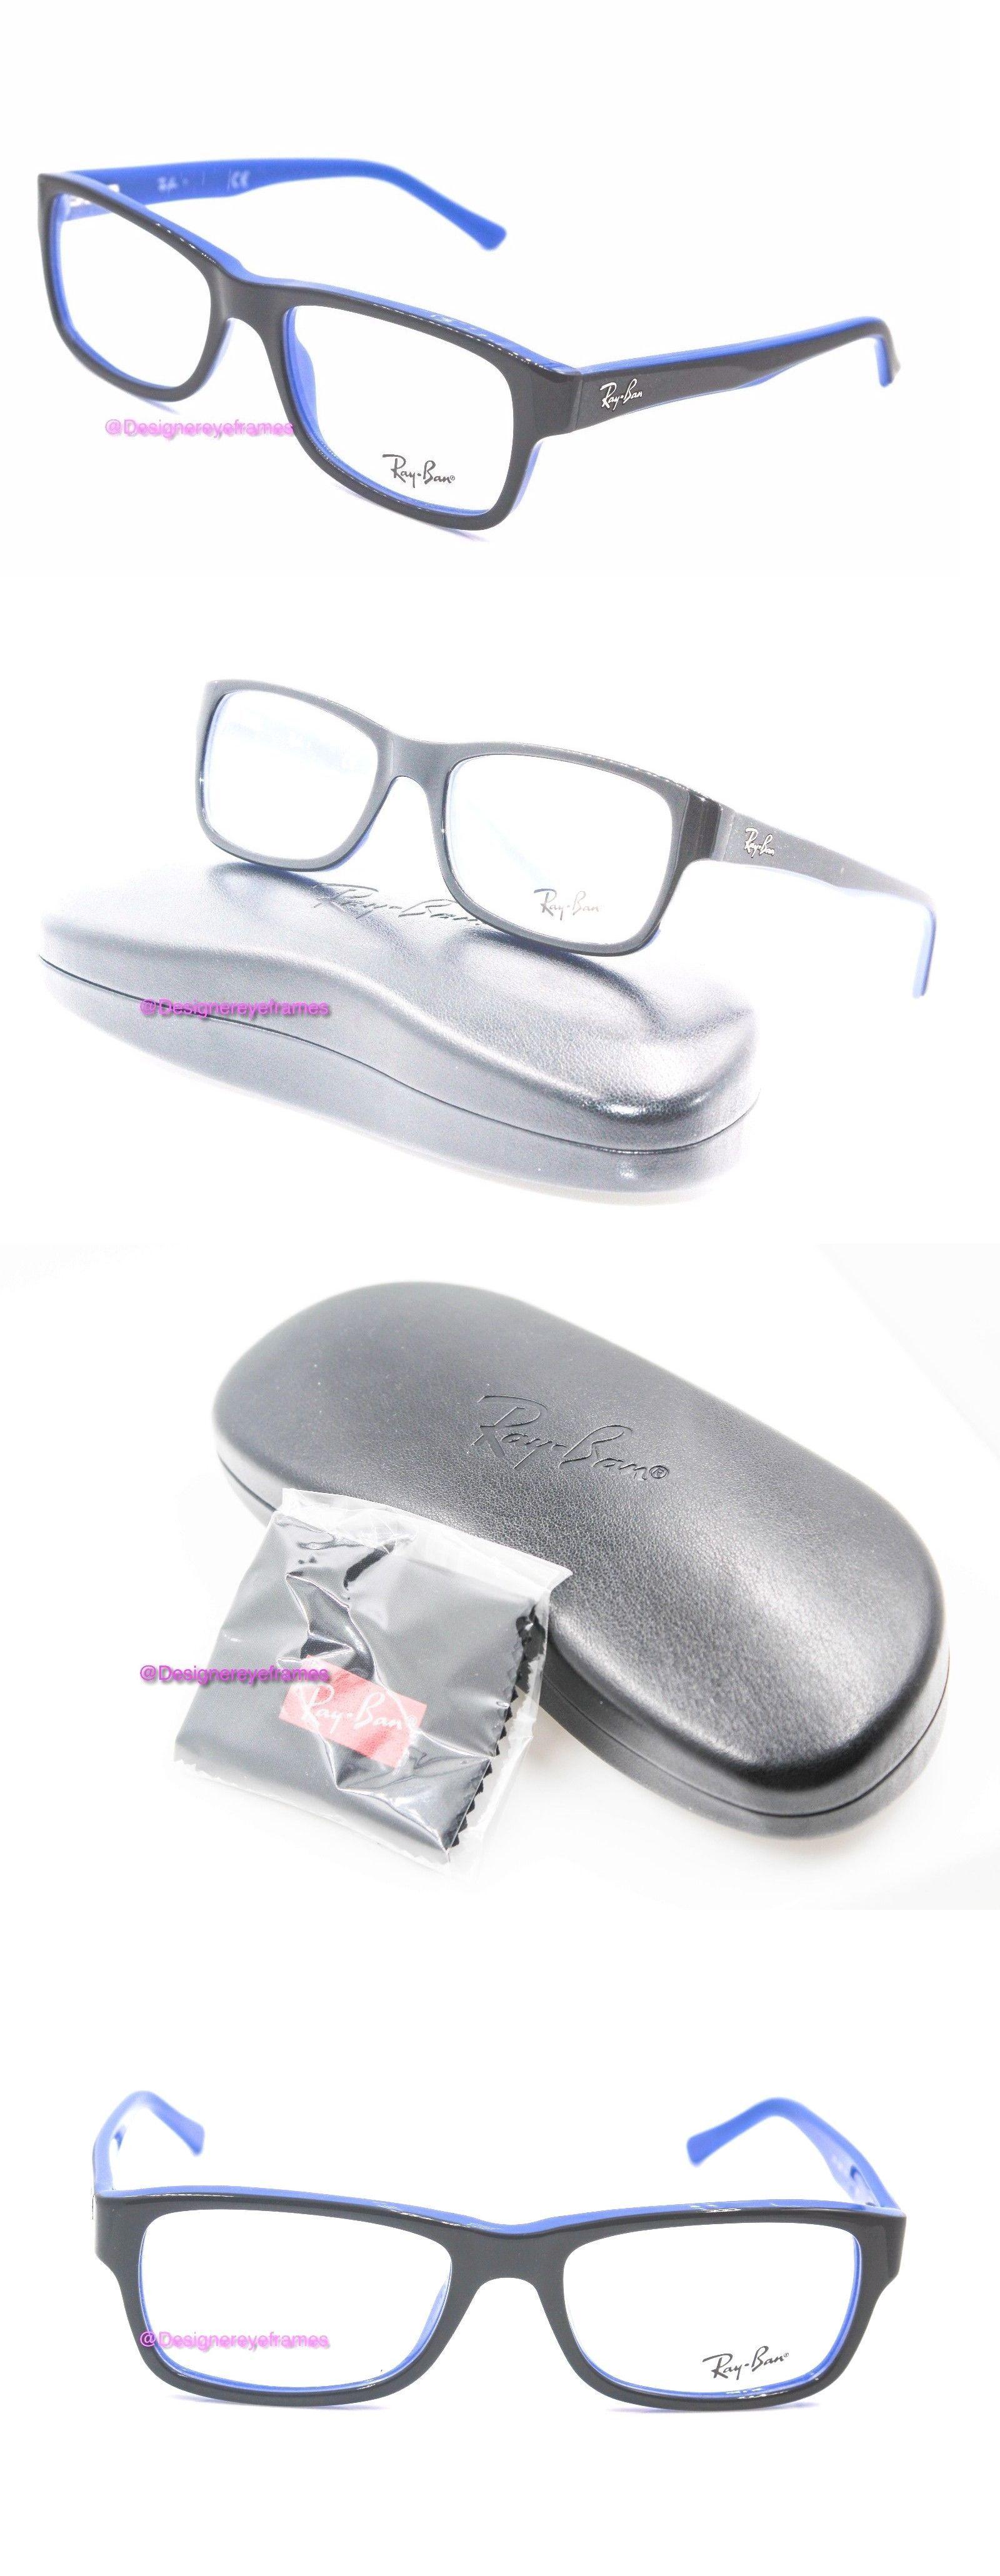 b86f4a59a7b61 ... discount eyeglass frames ray ban rb 5268 5179 black blue rectangular  52mm eyeglasses nwt auth b3195